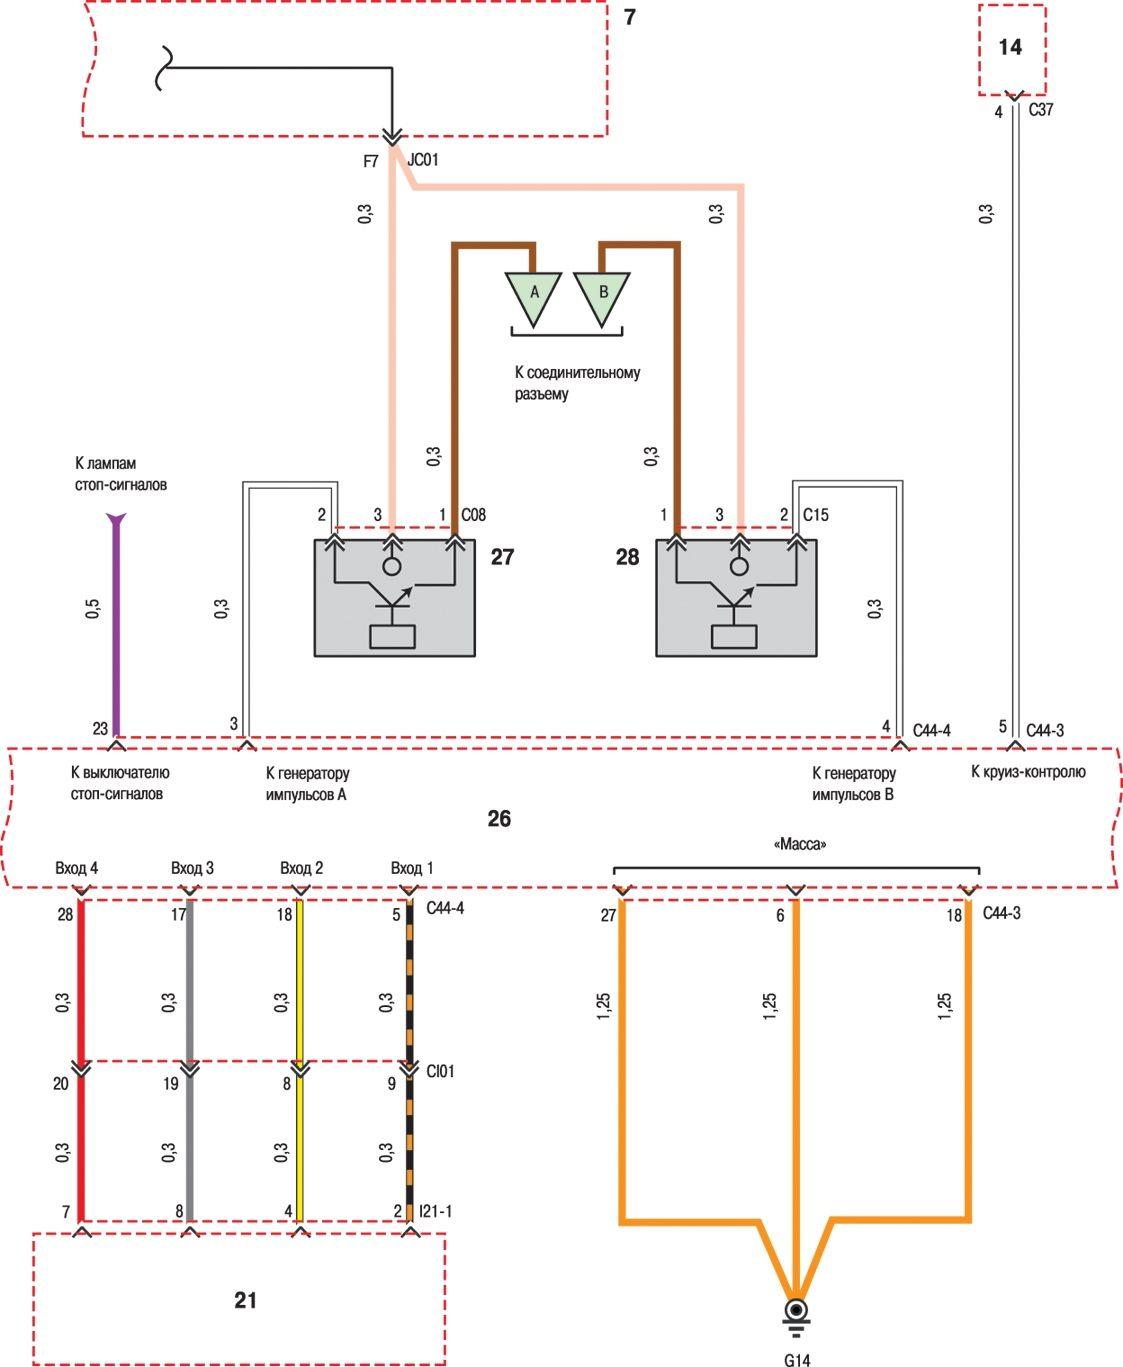 Схема электрооборудования хендай соната фото 231